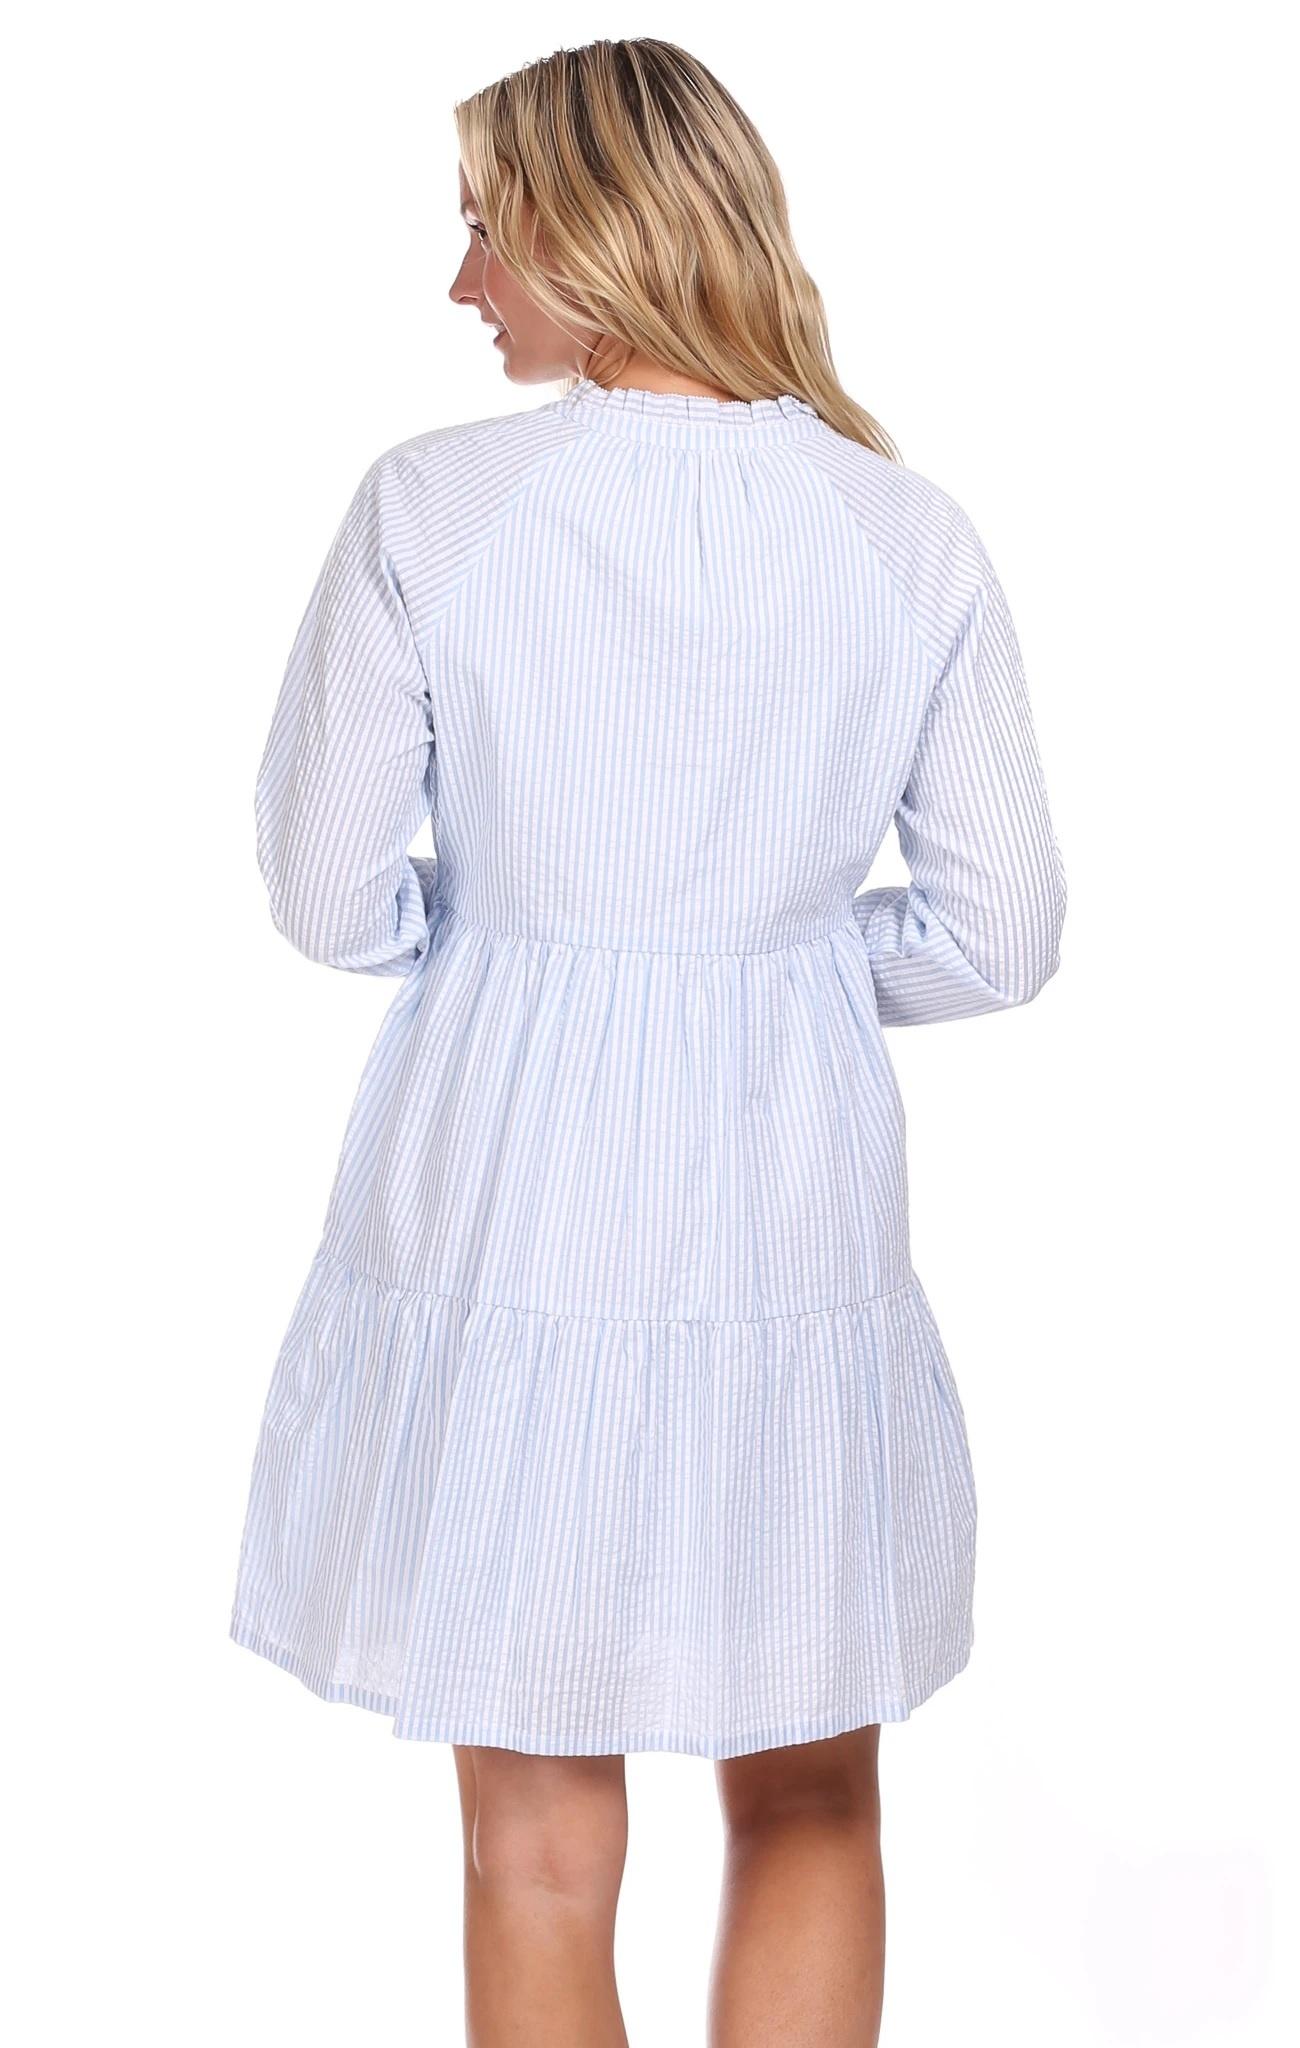 DUFFIELD LANE Fiona dress